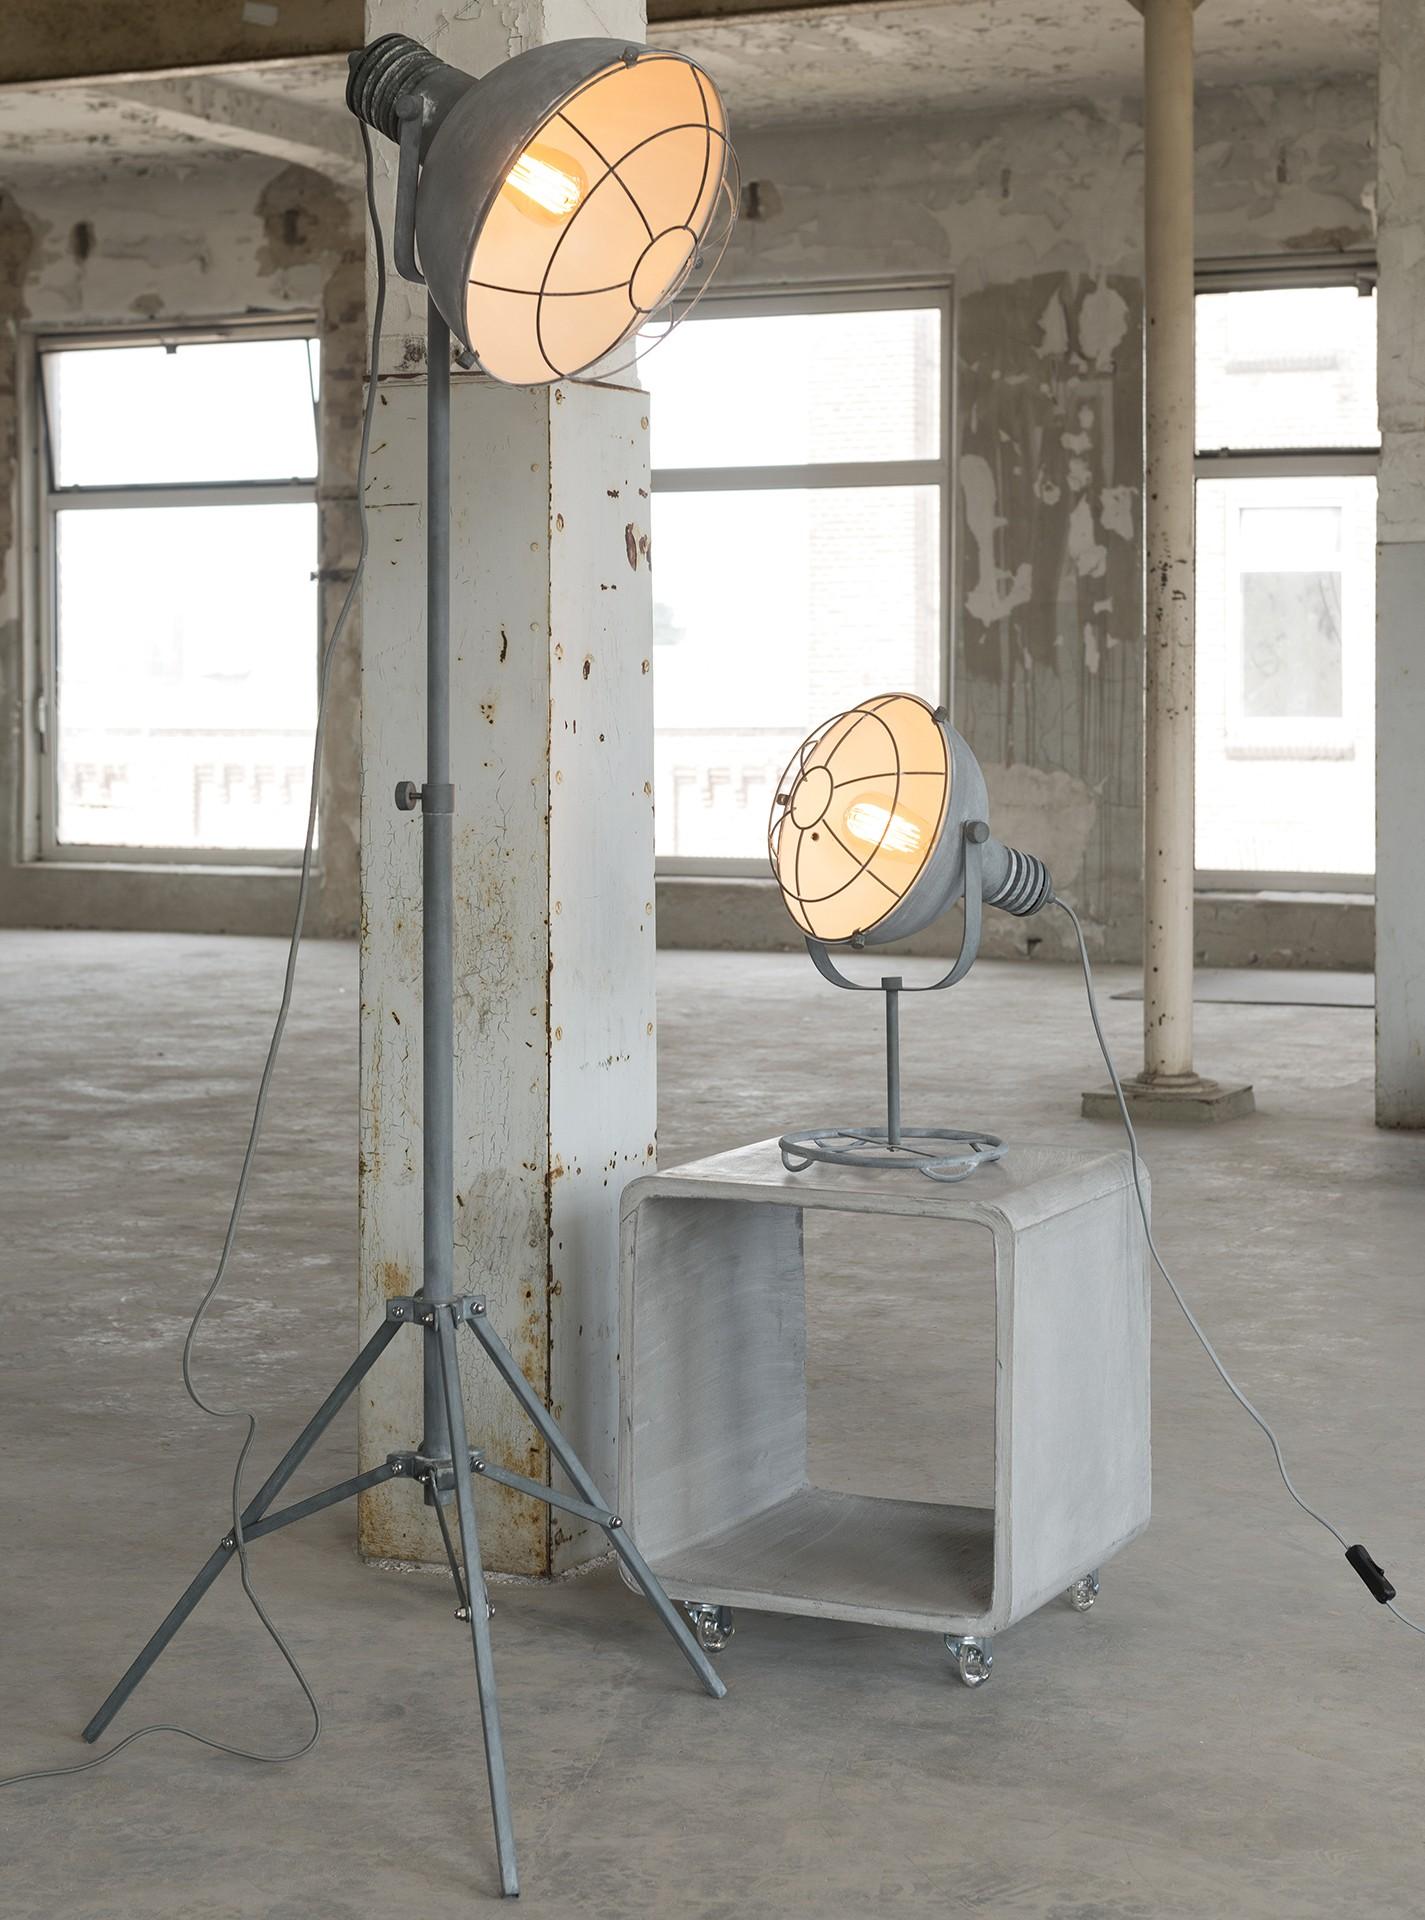 Stehlampe Industrie Metall grau, Stehleuchte grau, Höhe 170 cm